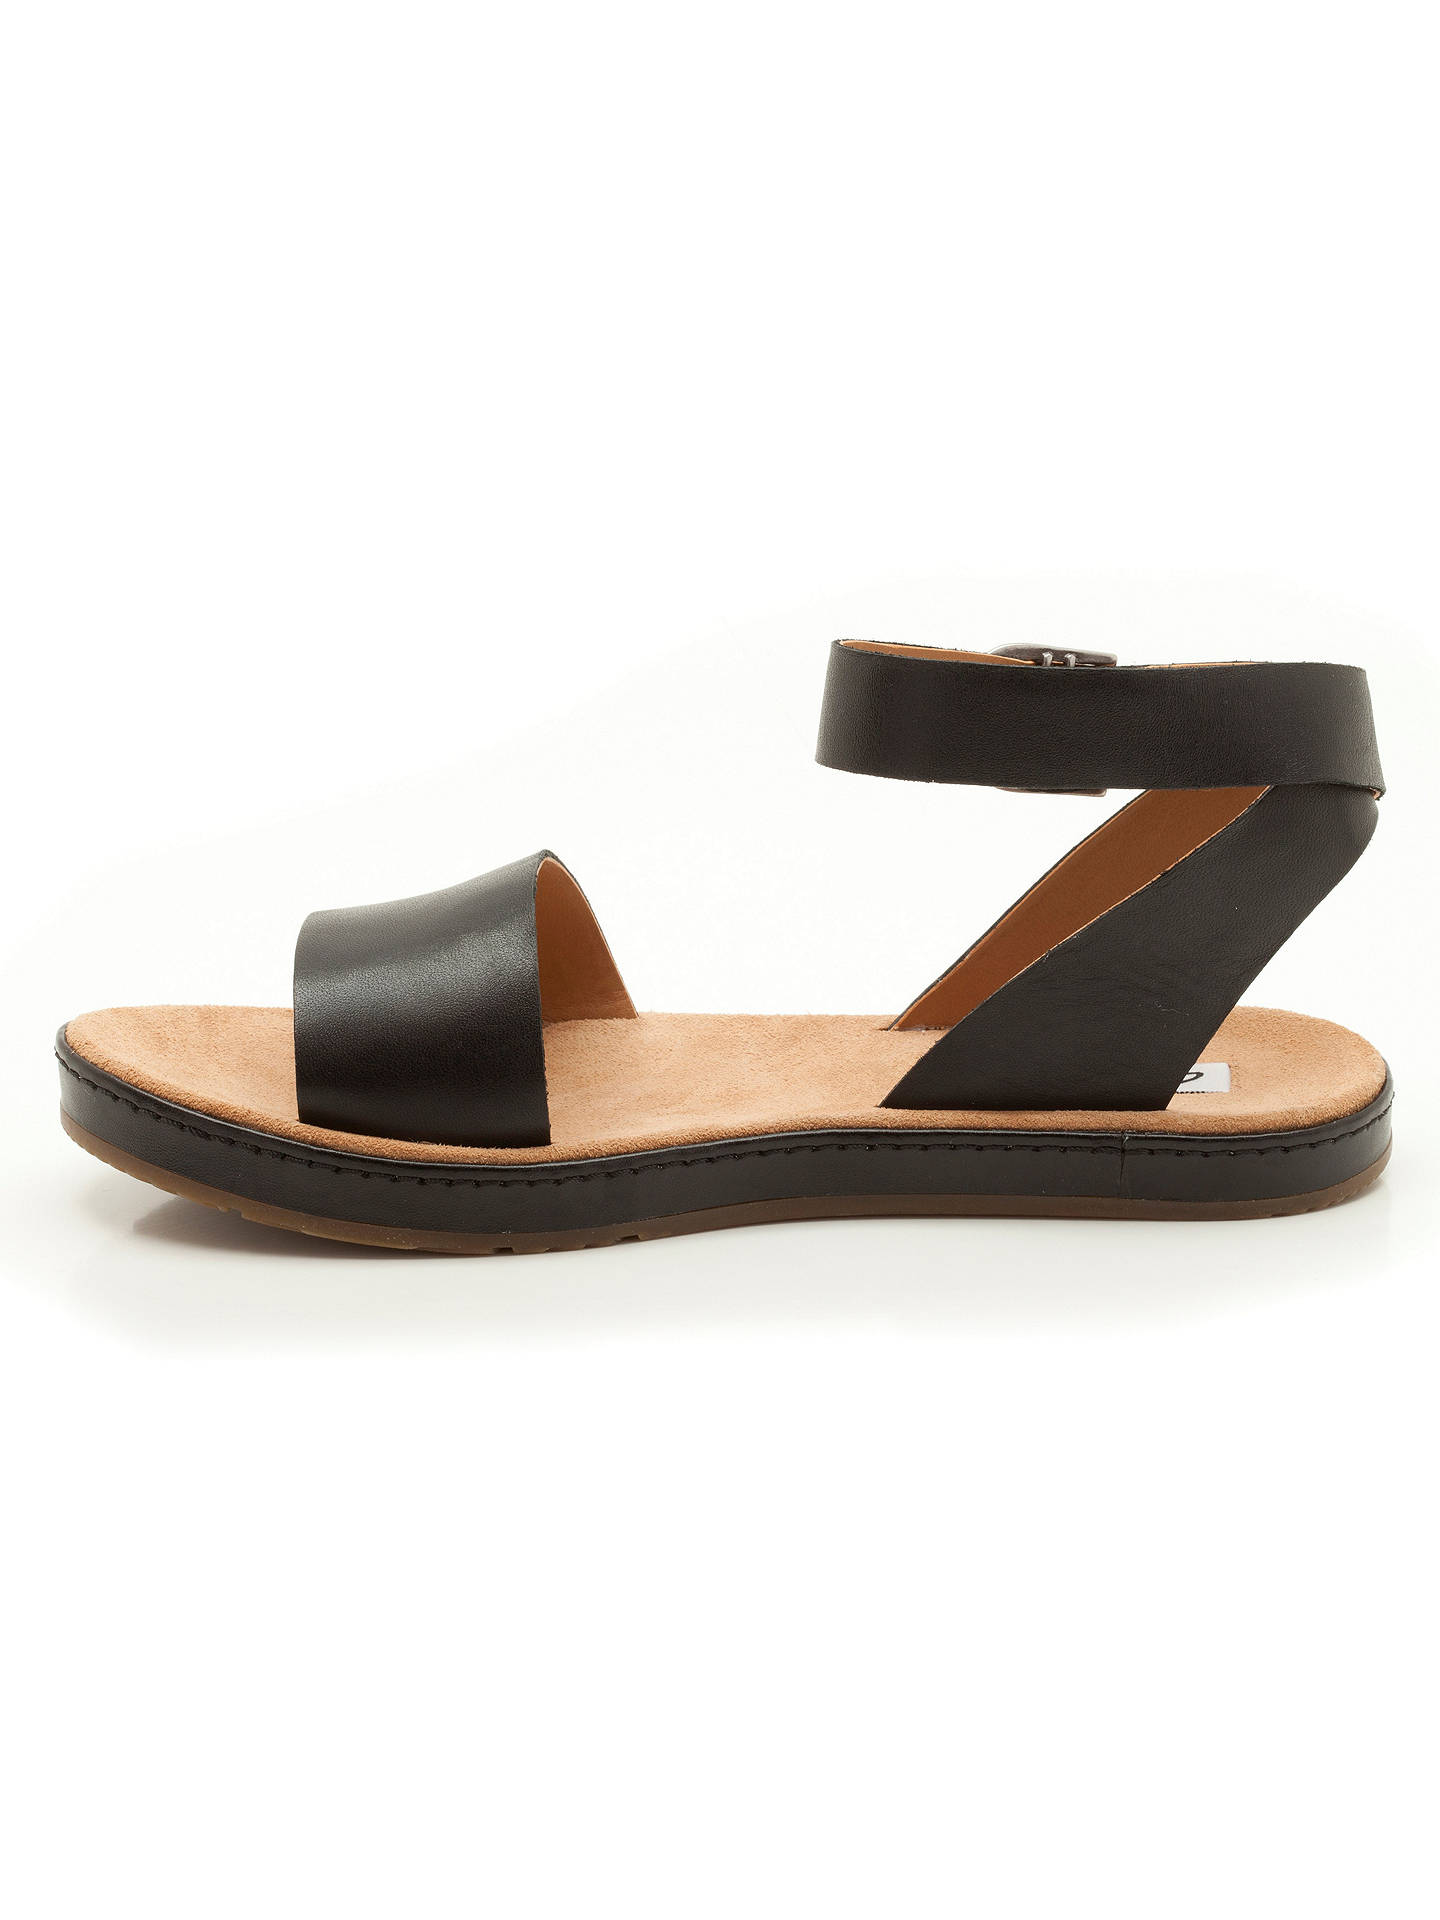 593567dc7199 Clarks Romantic Moon Leather Sandals at John Lewis   Partners